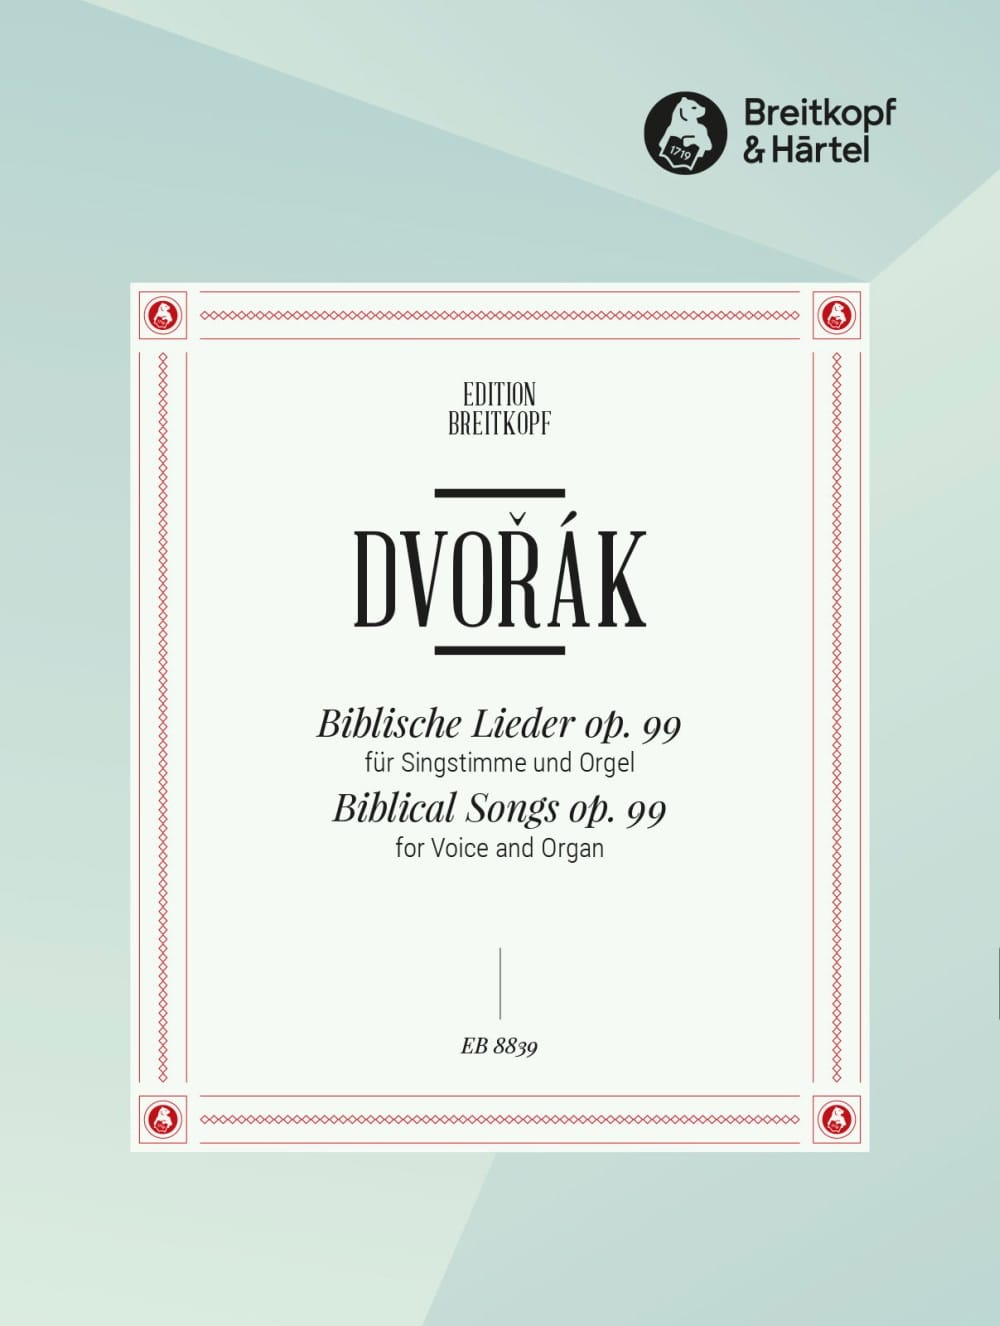 Biblische Lieder op. 99 - DVORAK - Partition - laflutedepan.com